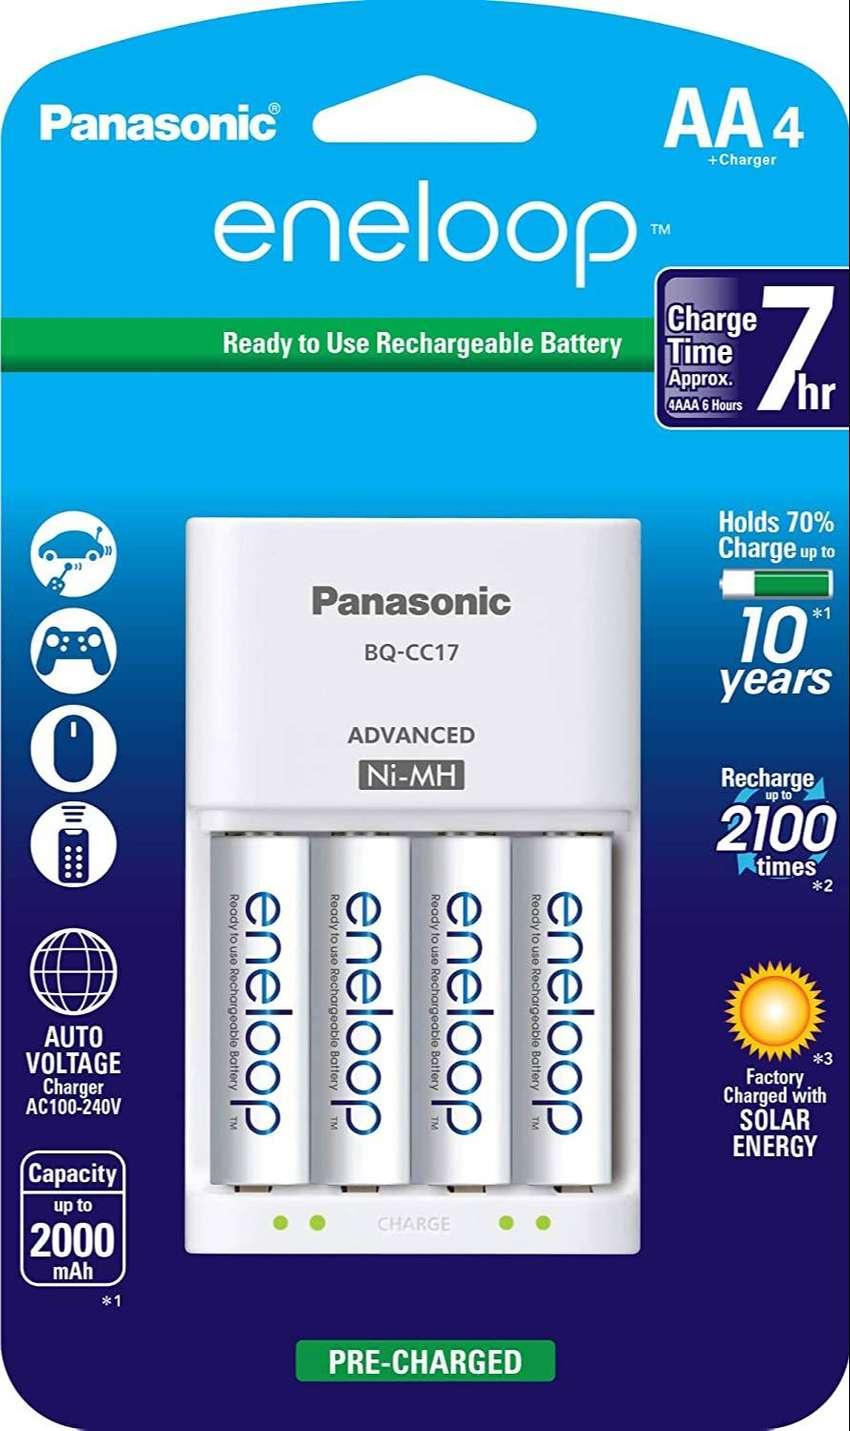 Baterias Eneloop Panasonic Sanyo 4aa+cargador.  Made in Japan